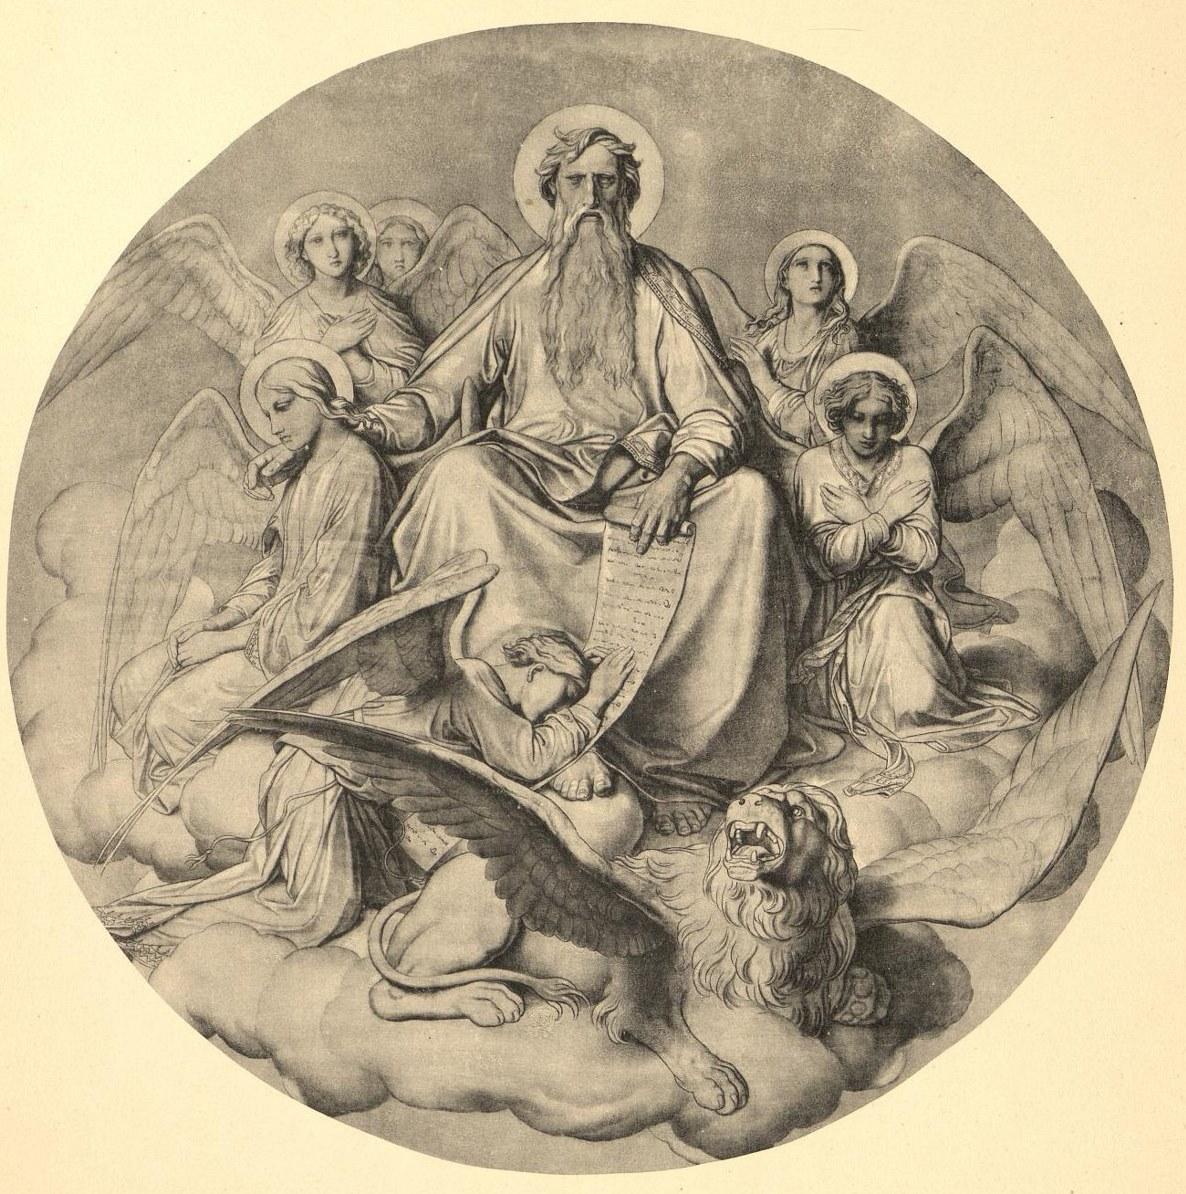 Samedi 8 mai 2021— Samedi lumineux  Saint apôtre et évangéliste Marc